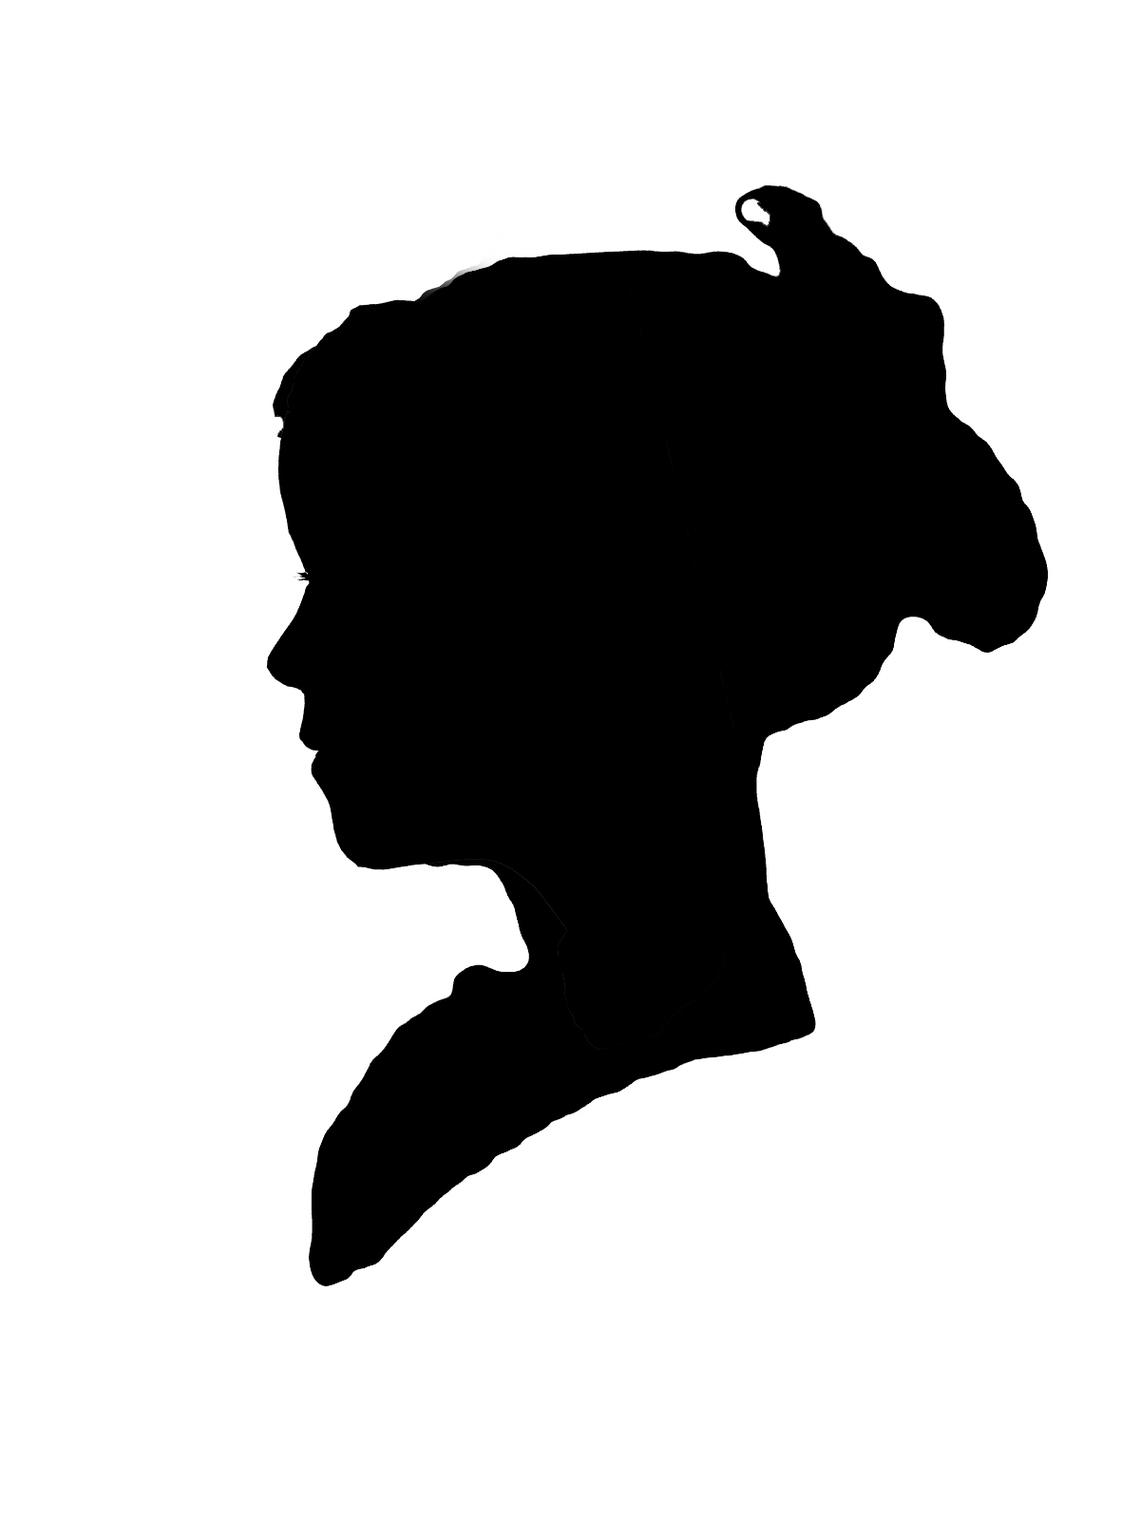 1140x1520 Free Clipart Headshot Of Woman